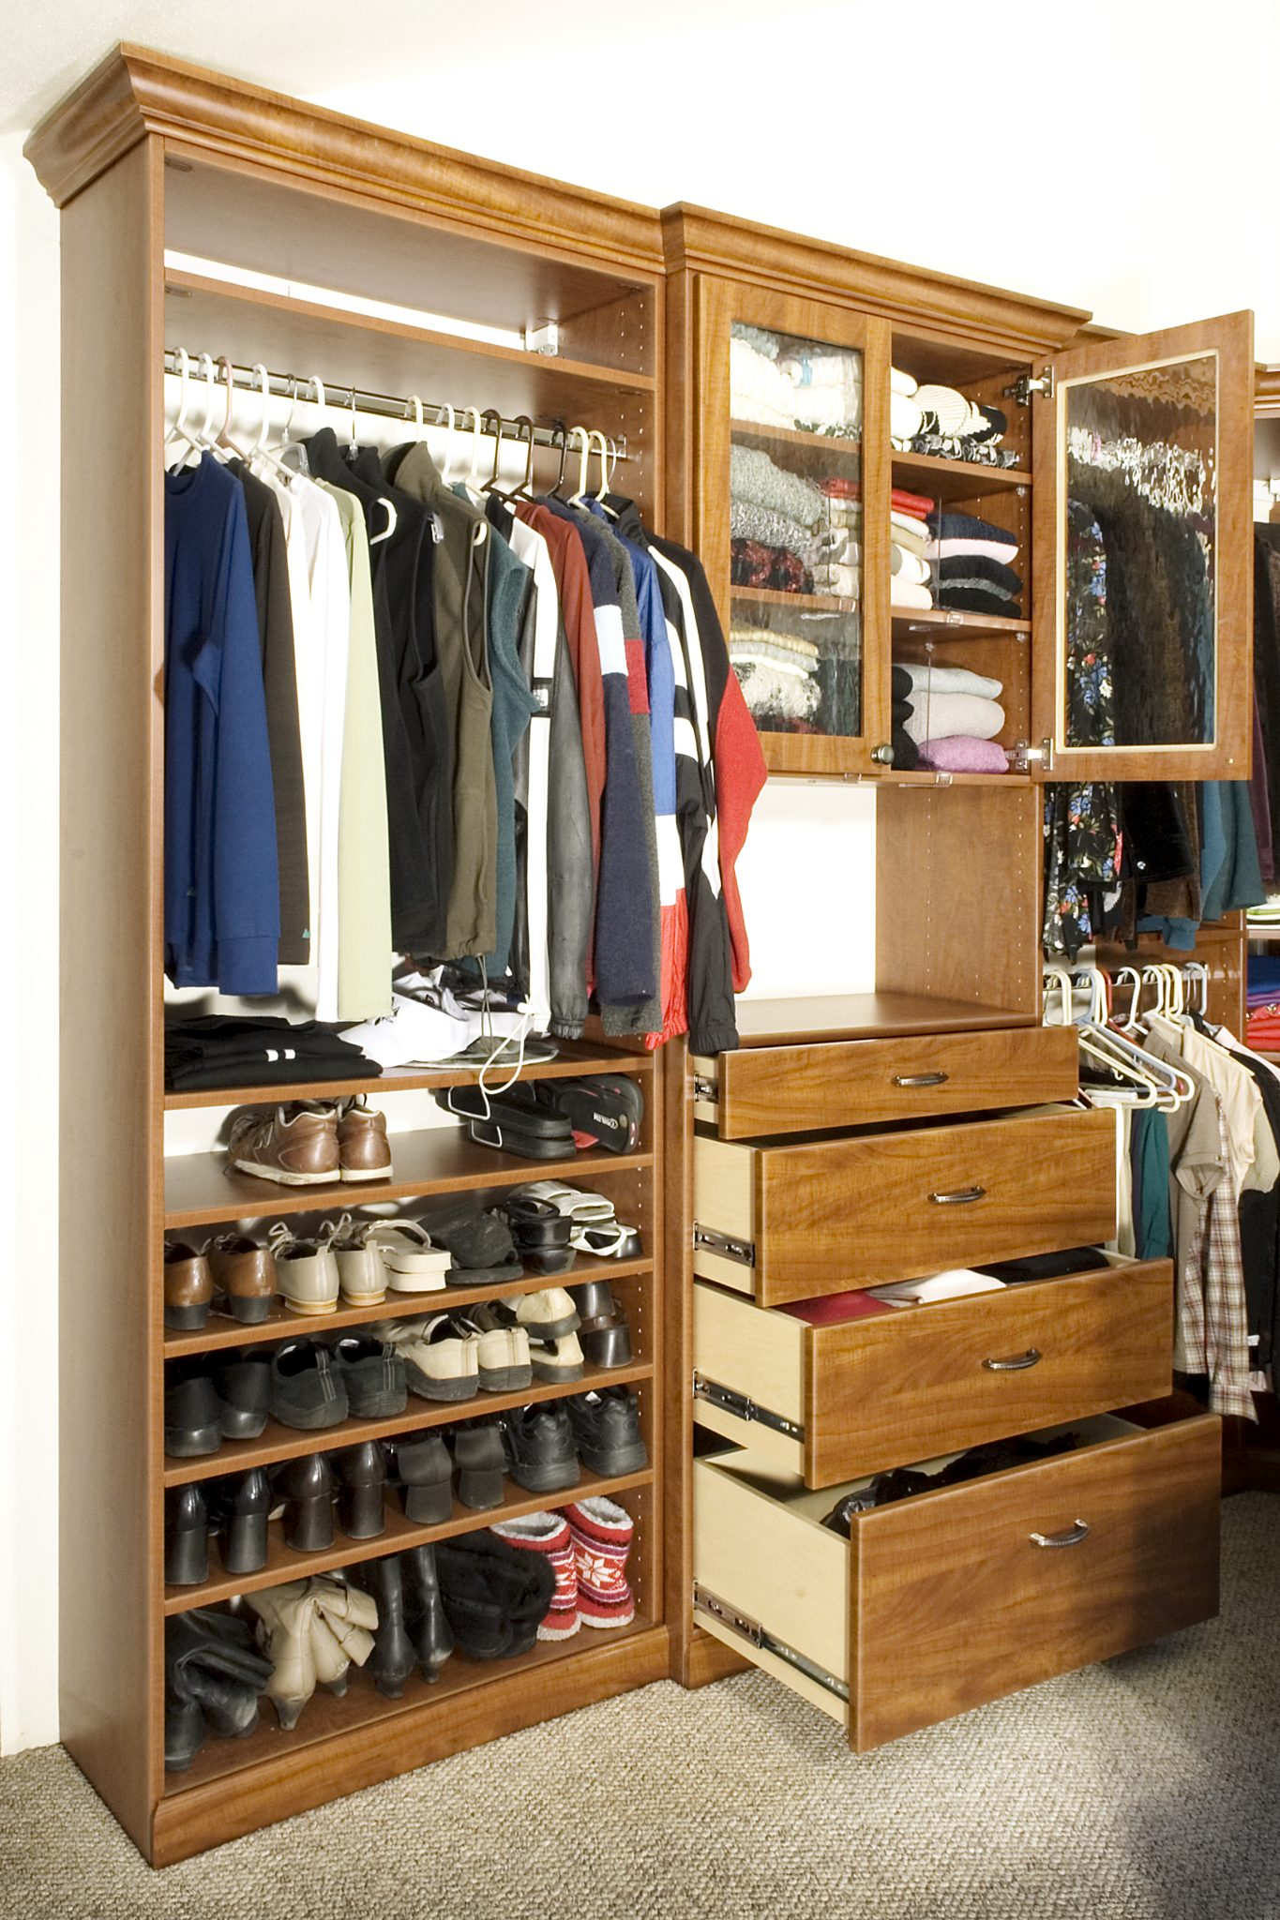 Superieur Closet Redesign Experts In Denver. Walk In Closet, Custom Closet, Small  Space Experts